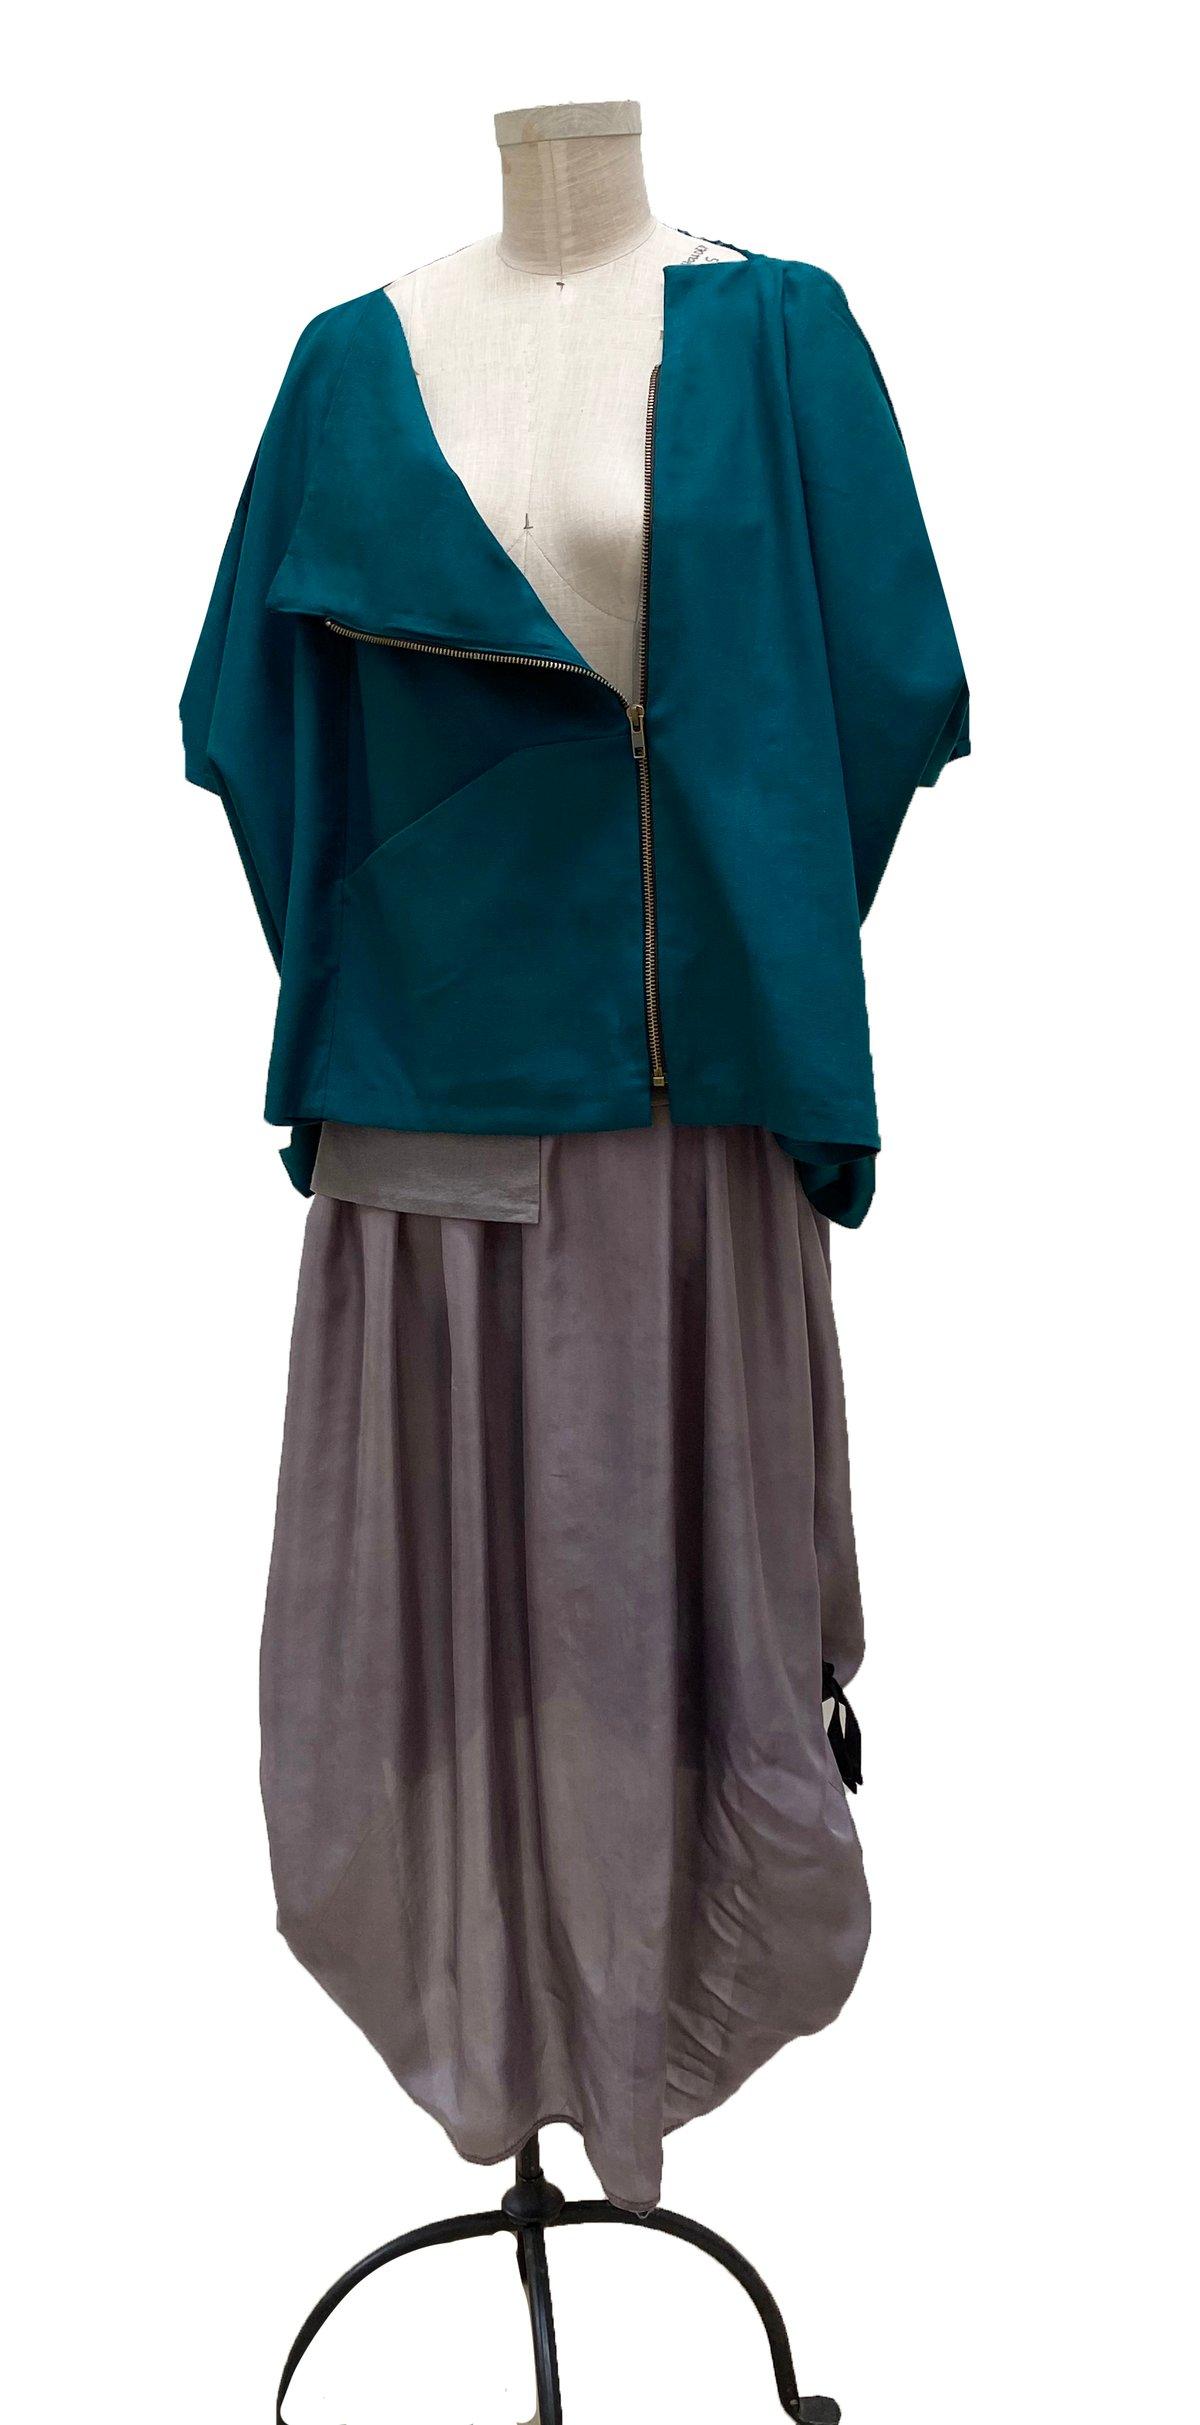 Image of beta kimono in teal